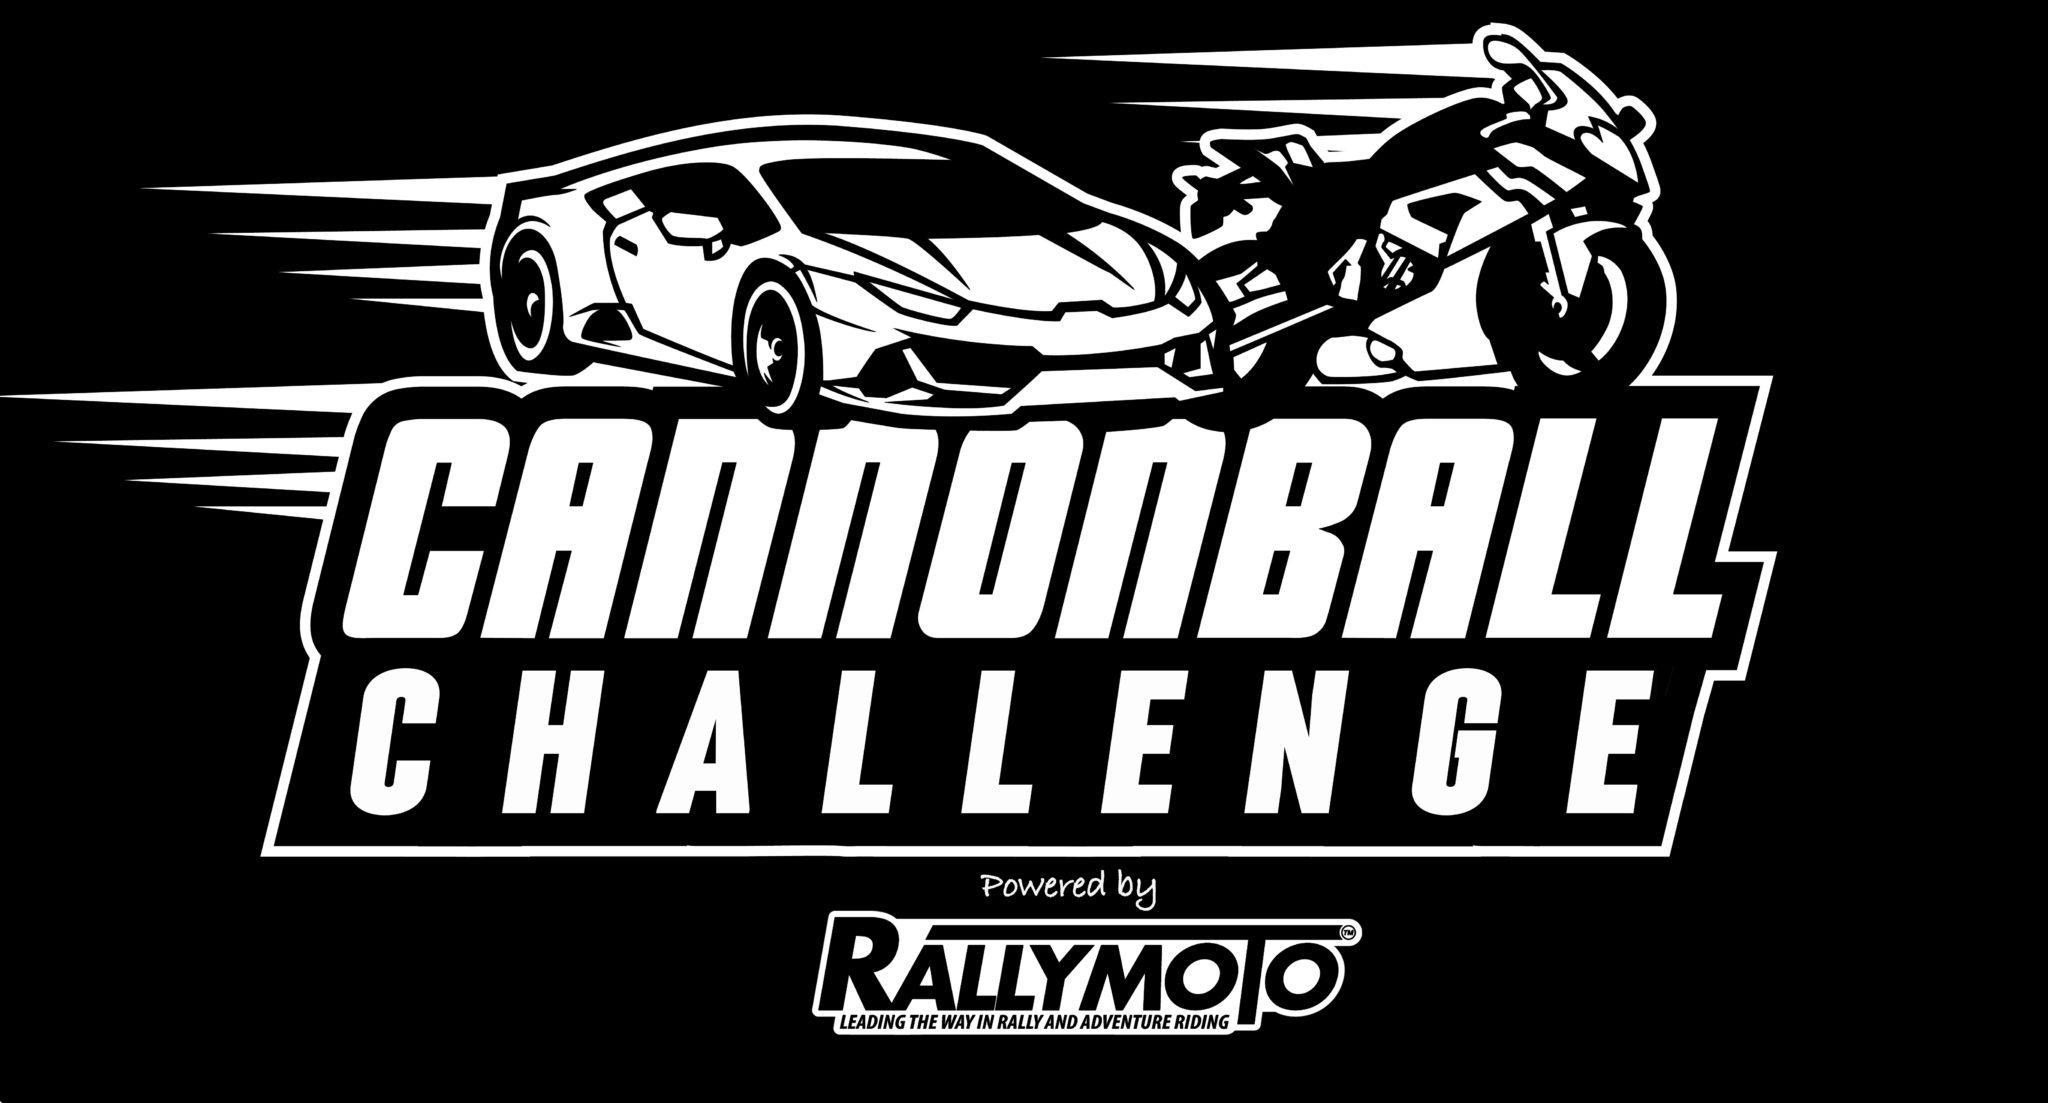 Cannonball Challenge - a tarmac based roadbook challenge